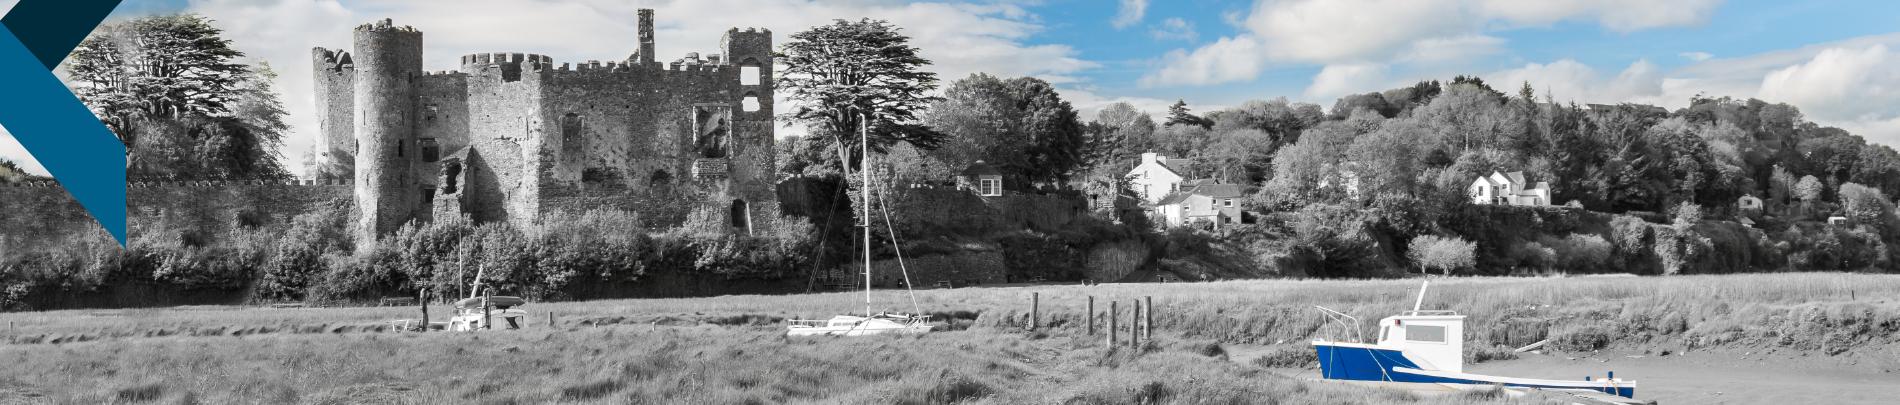 Laugharne castle and estuary